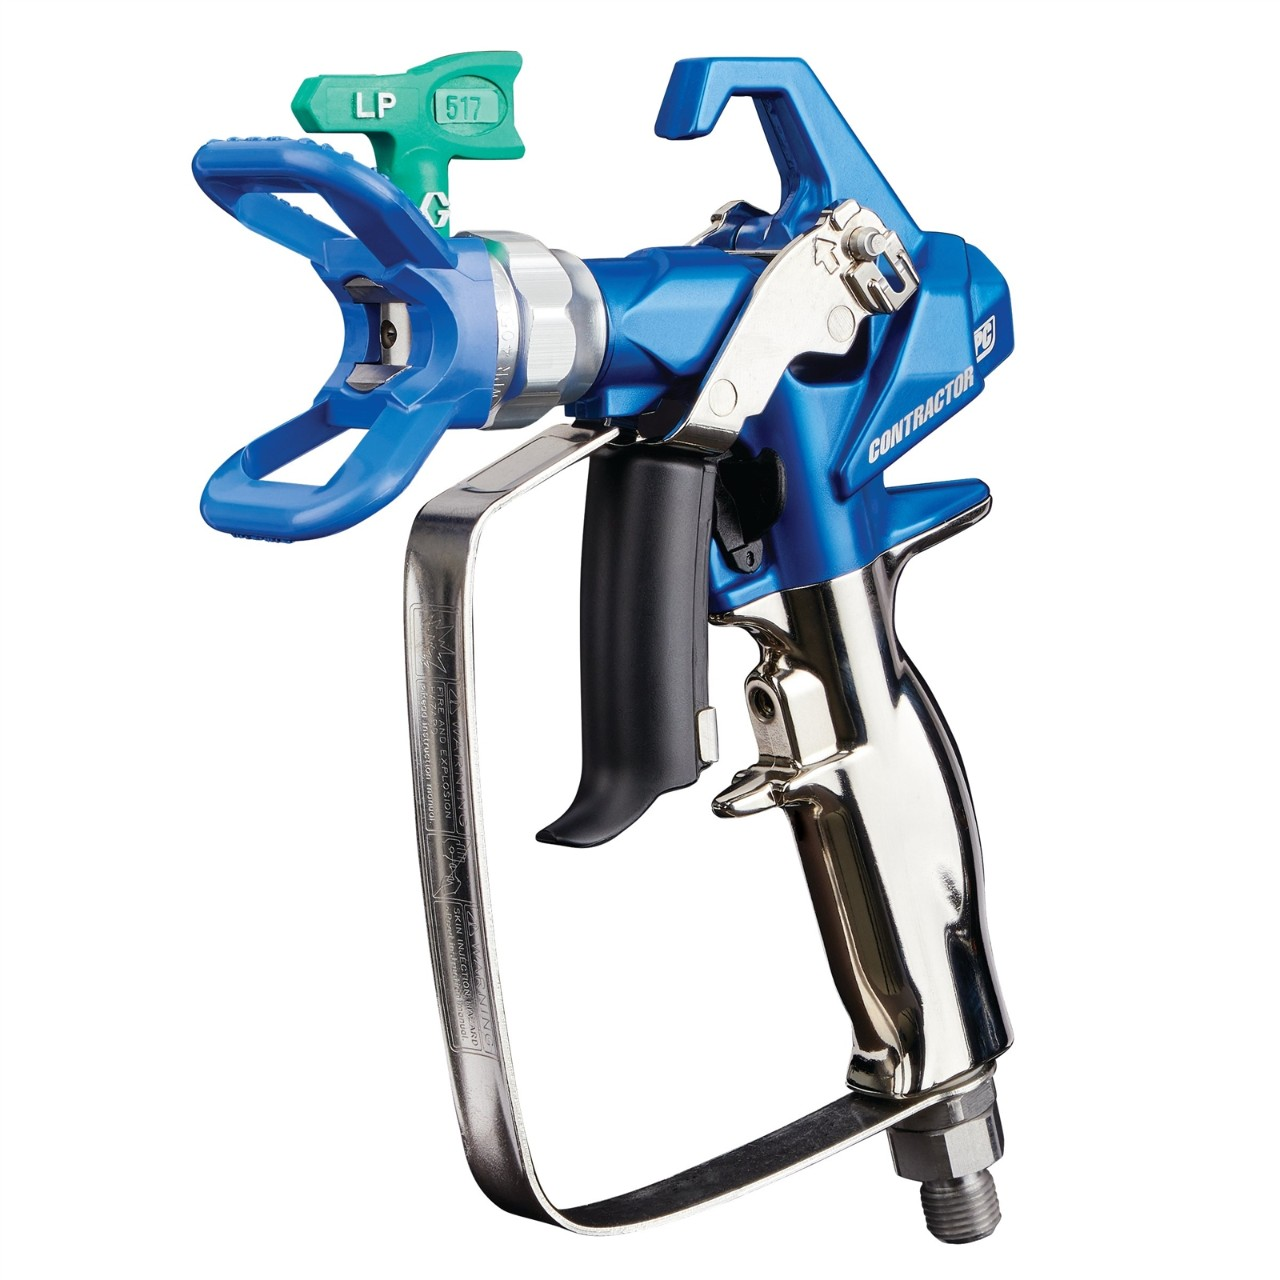 Contractor PC Airless Spray Gun - ProQuip